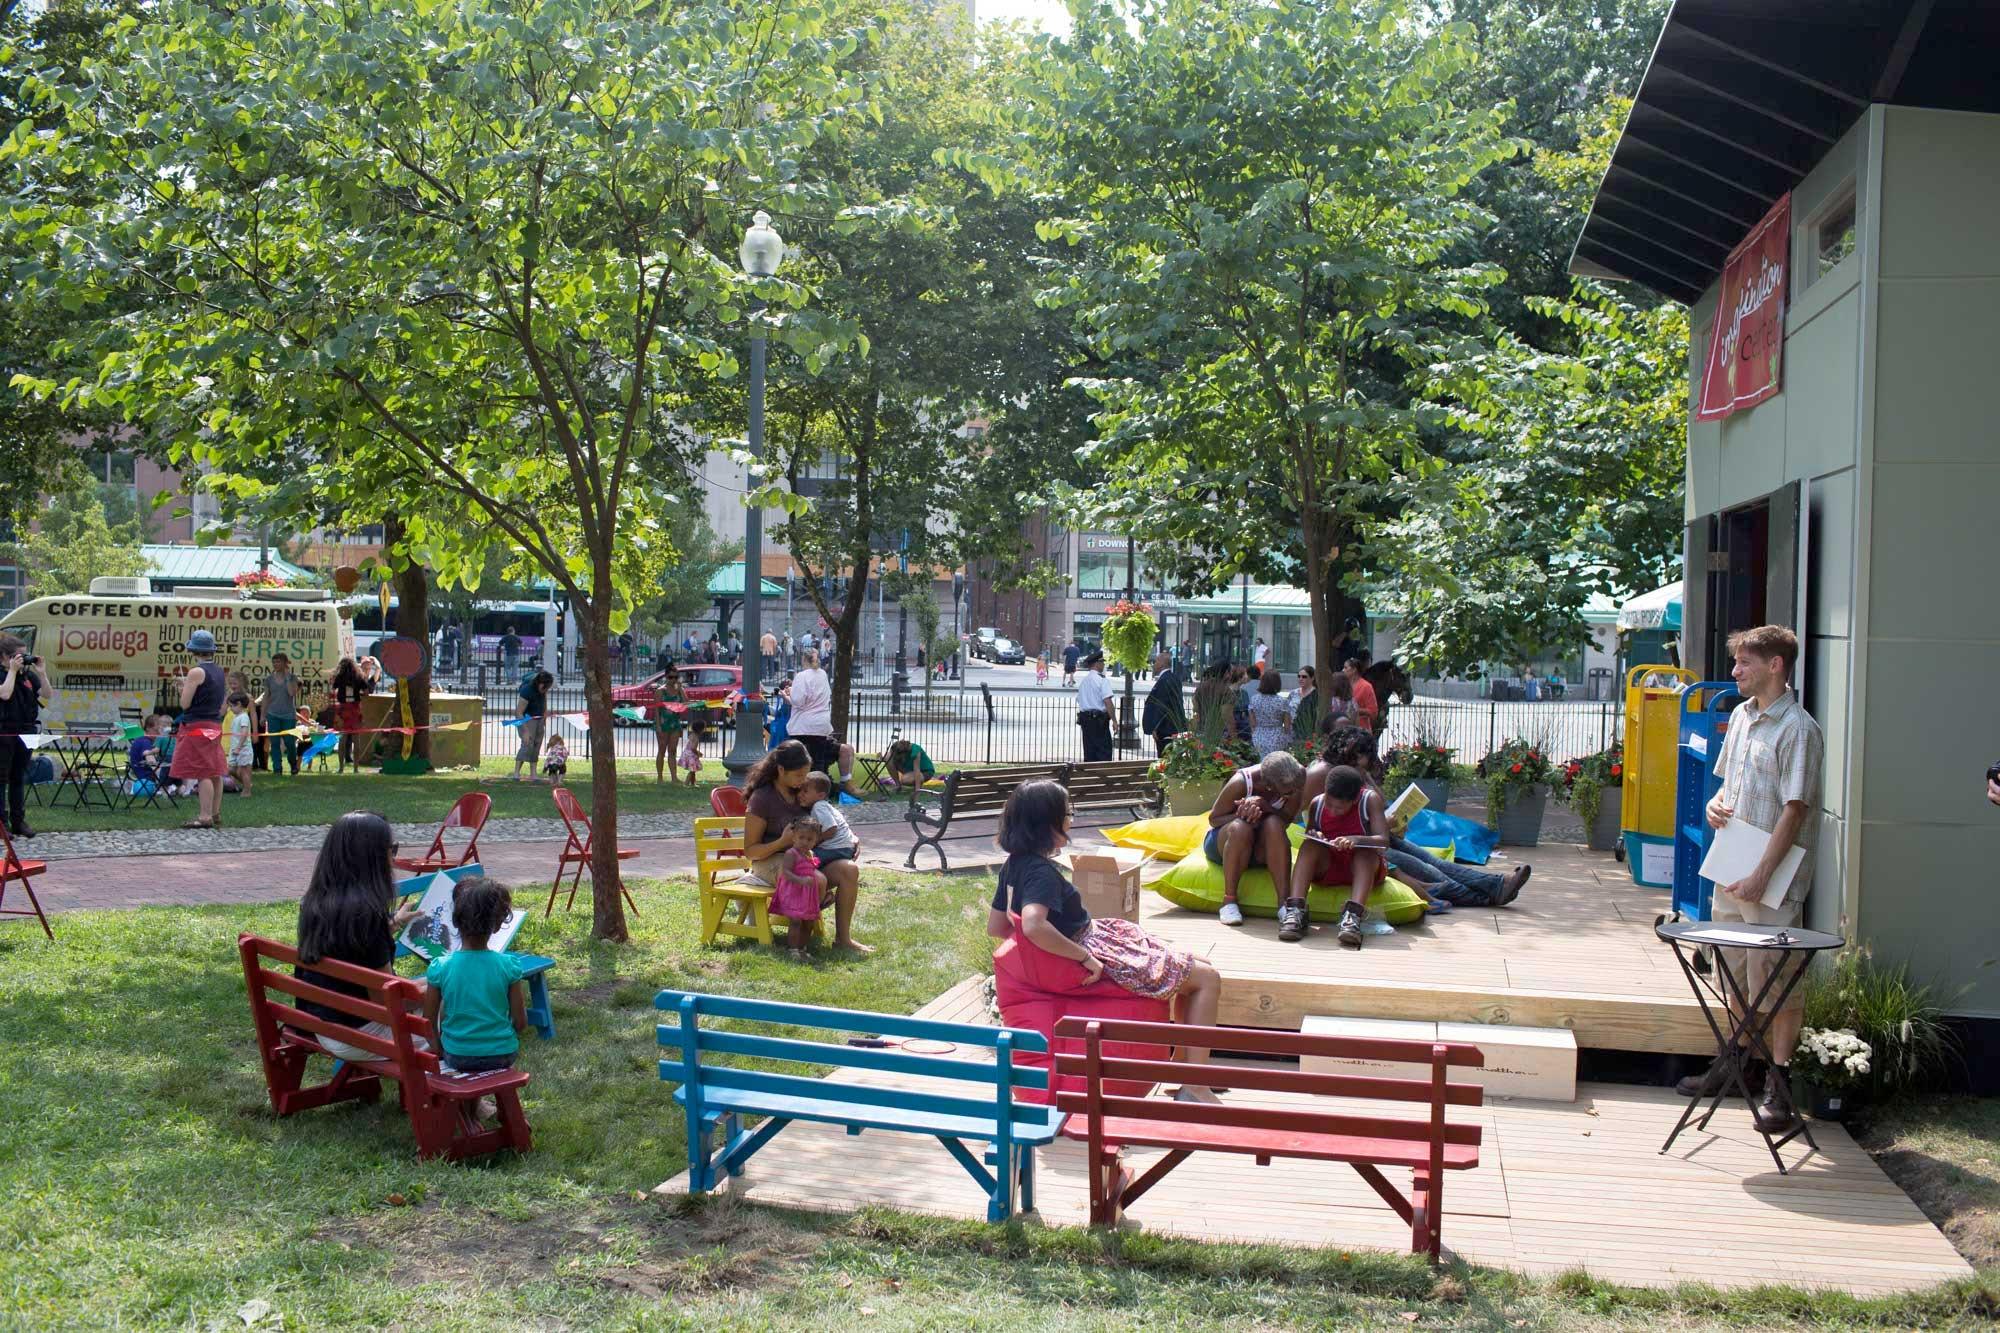 Ten reasons to build community through urban design